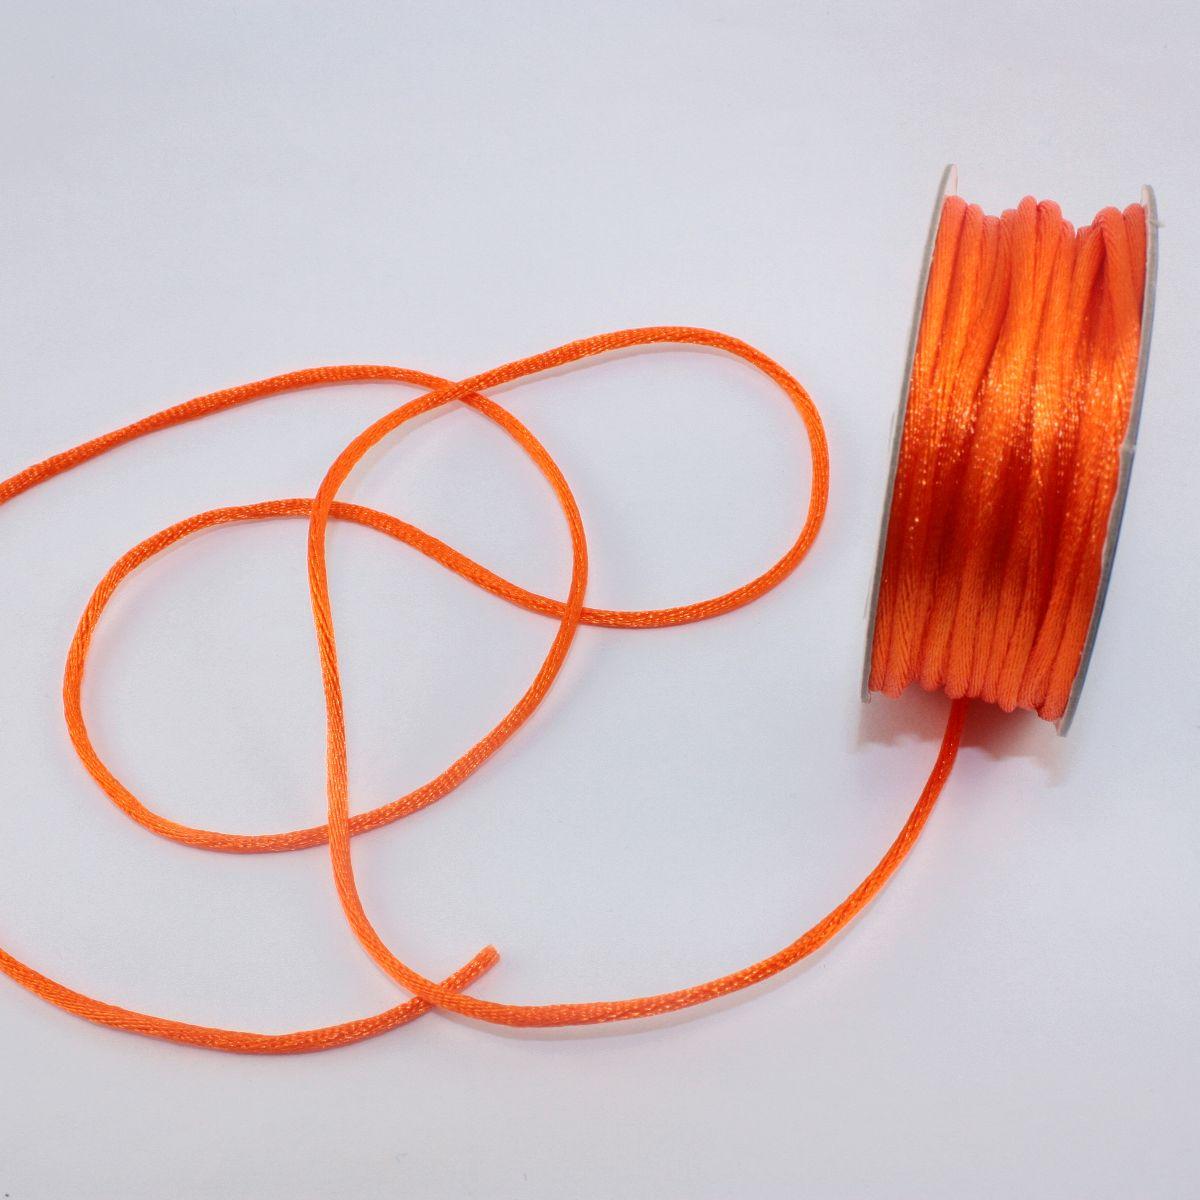 Cordelette en bobine orange sanguine 2 mm